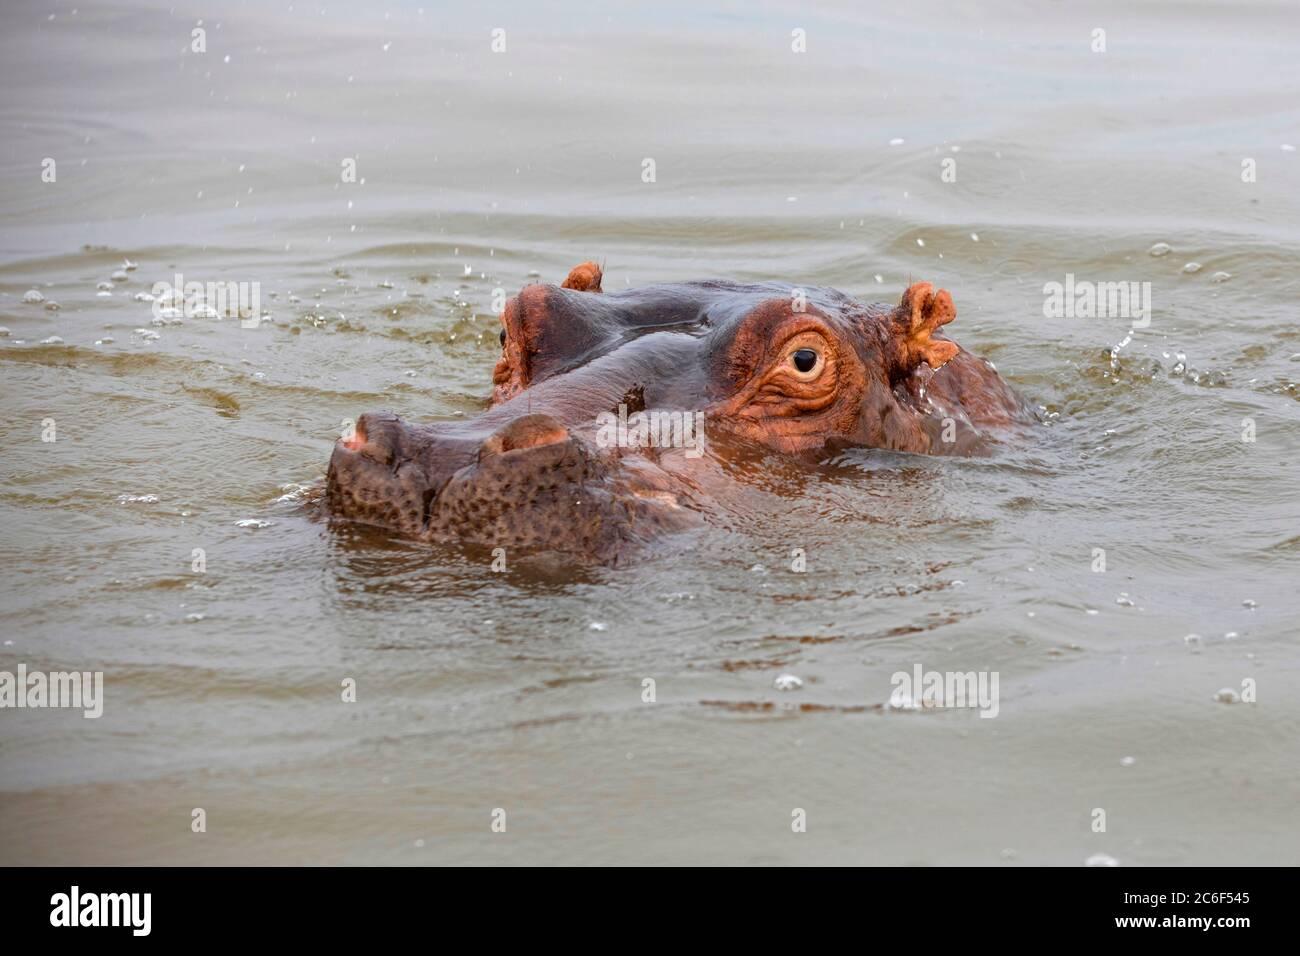 Close-up of surfacing hippopotamus / hippo (Hippopotamus amphibius) in Lake Hawassa  / Lake Awasa, Great Rift Valley, Southern Ethiopia, Africa Stock Photo